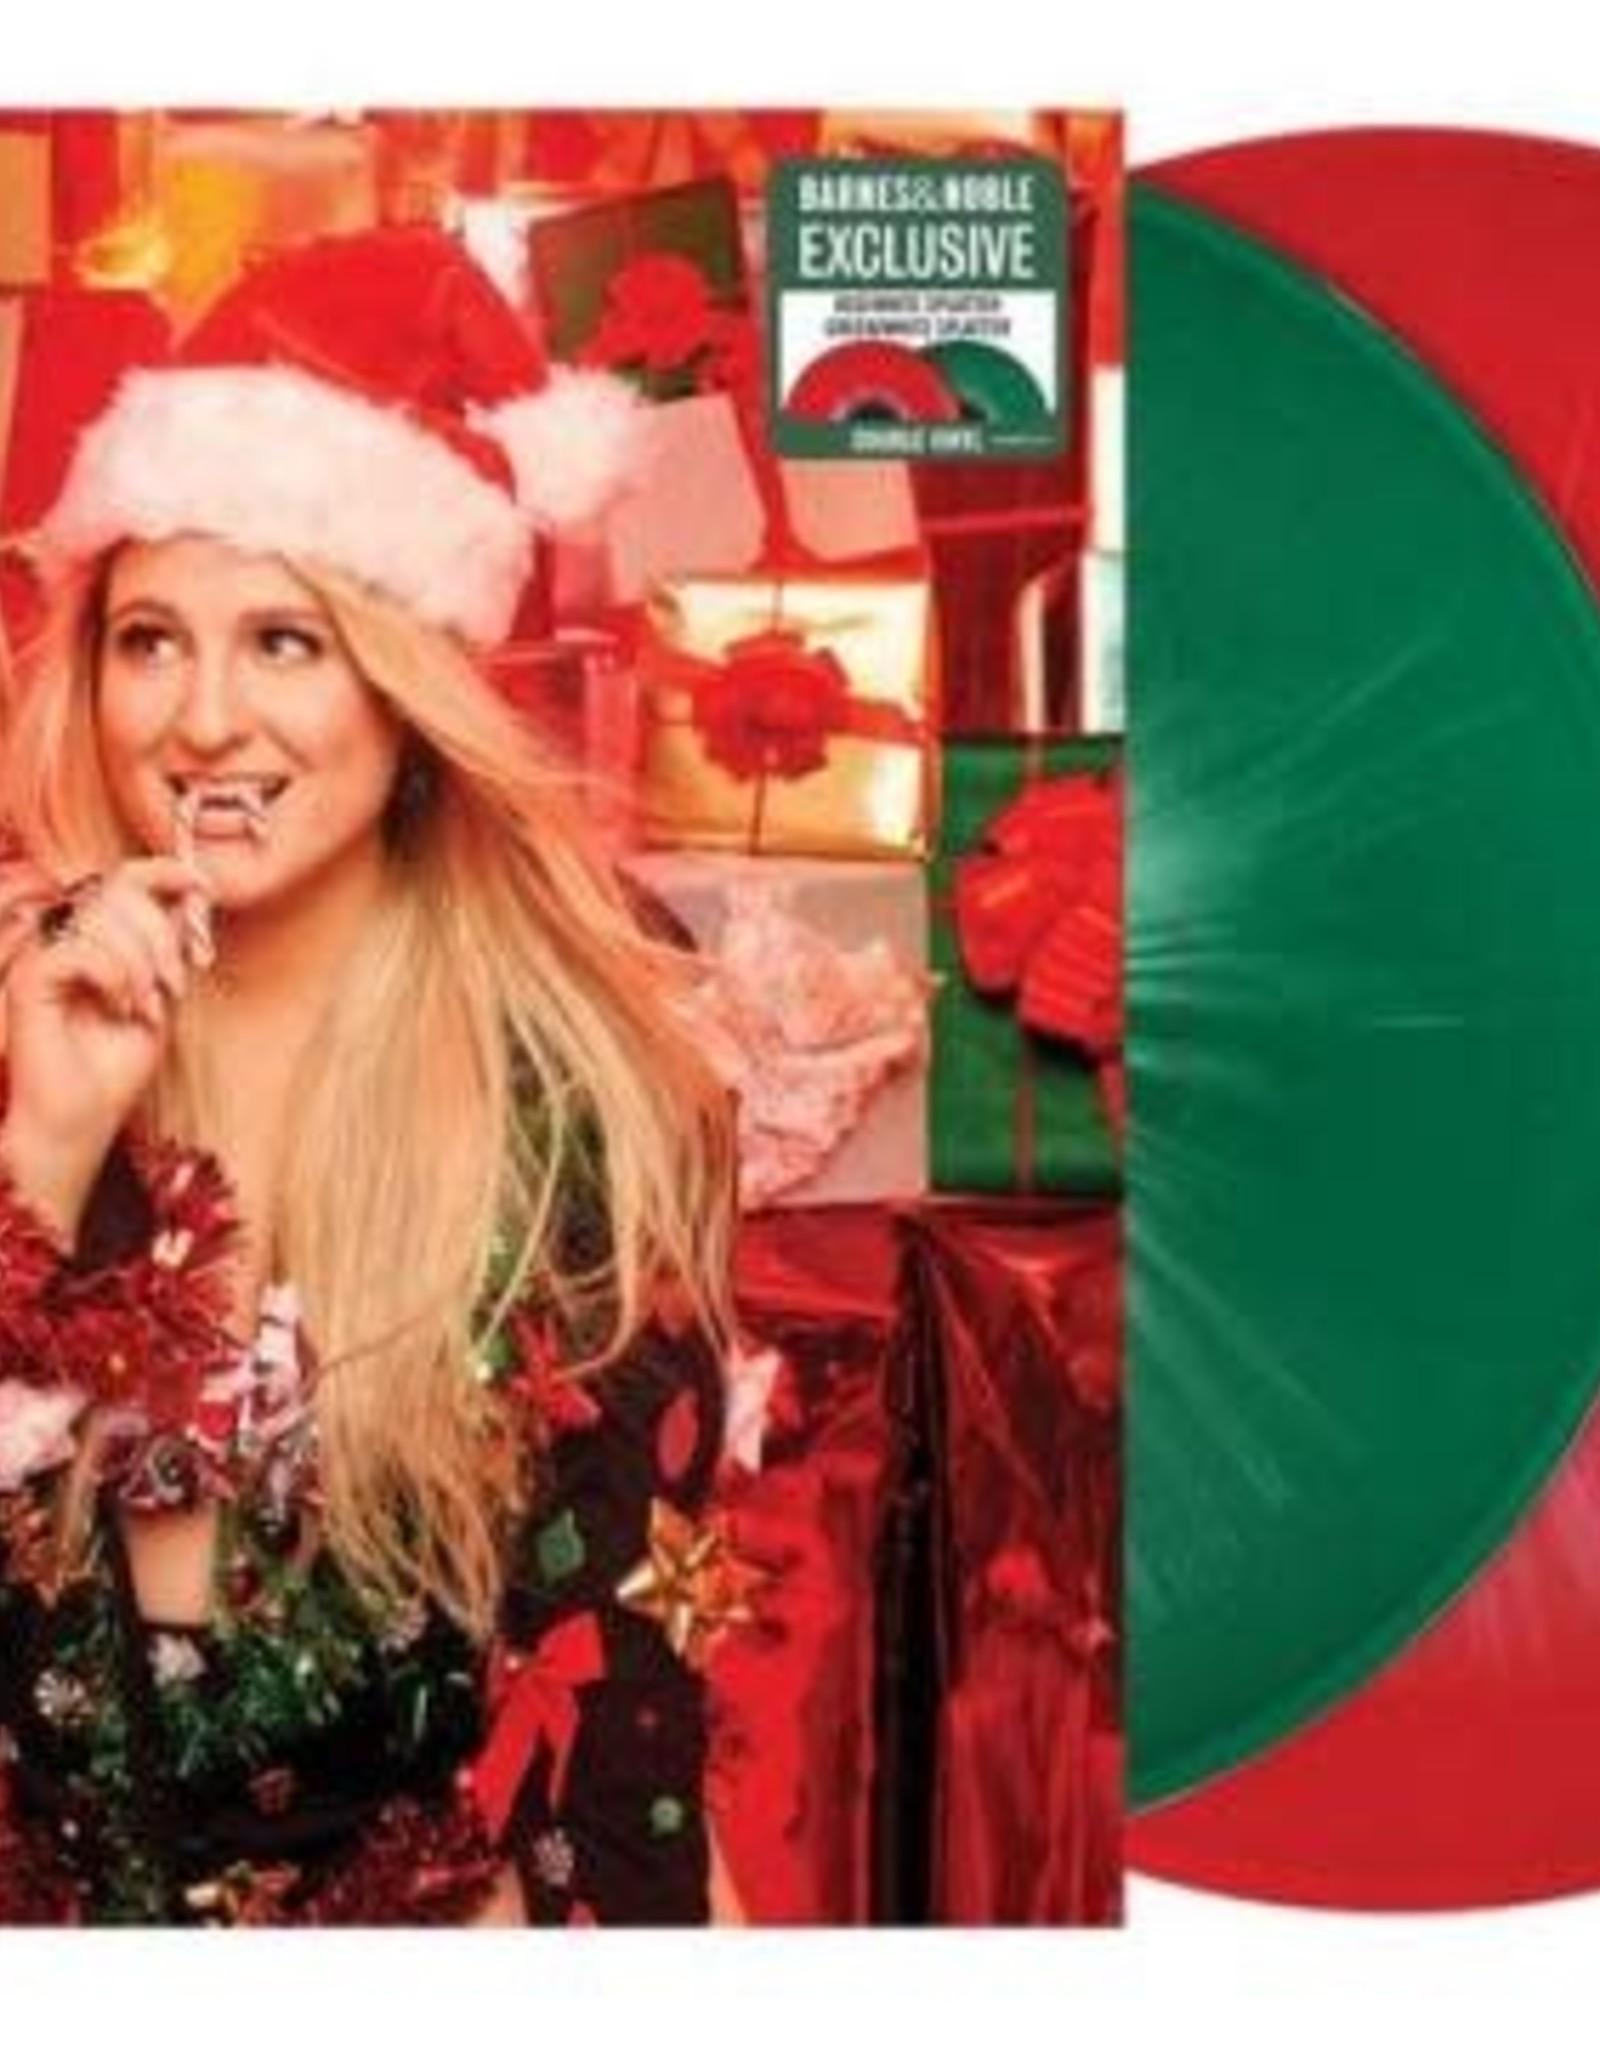 Meghan Trainor - A Very Trainor Chrismas (Red Swirl/Green Swirl Vinyl)]